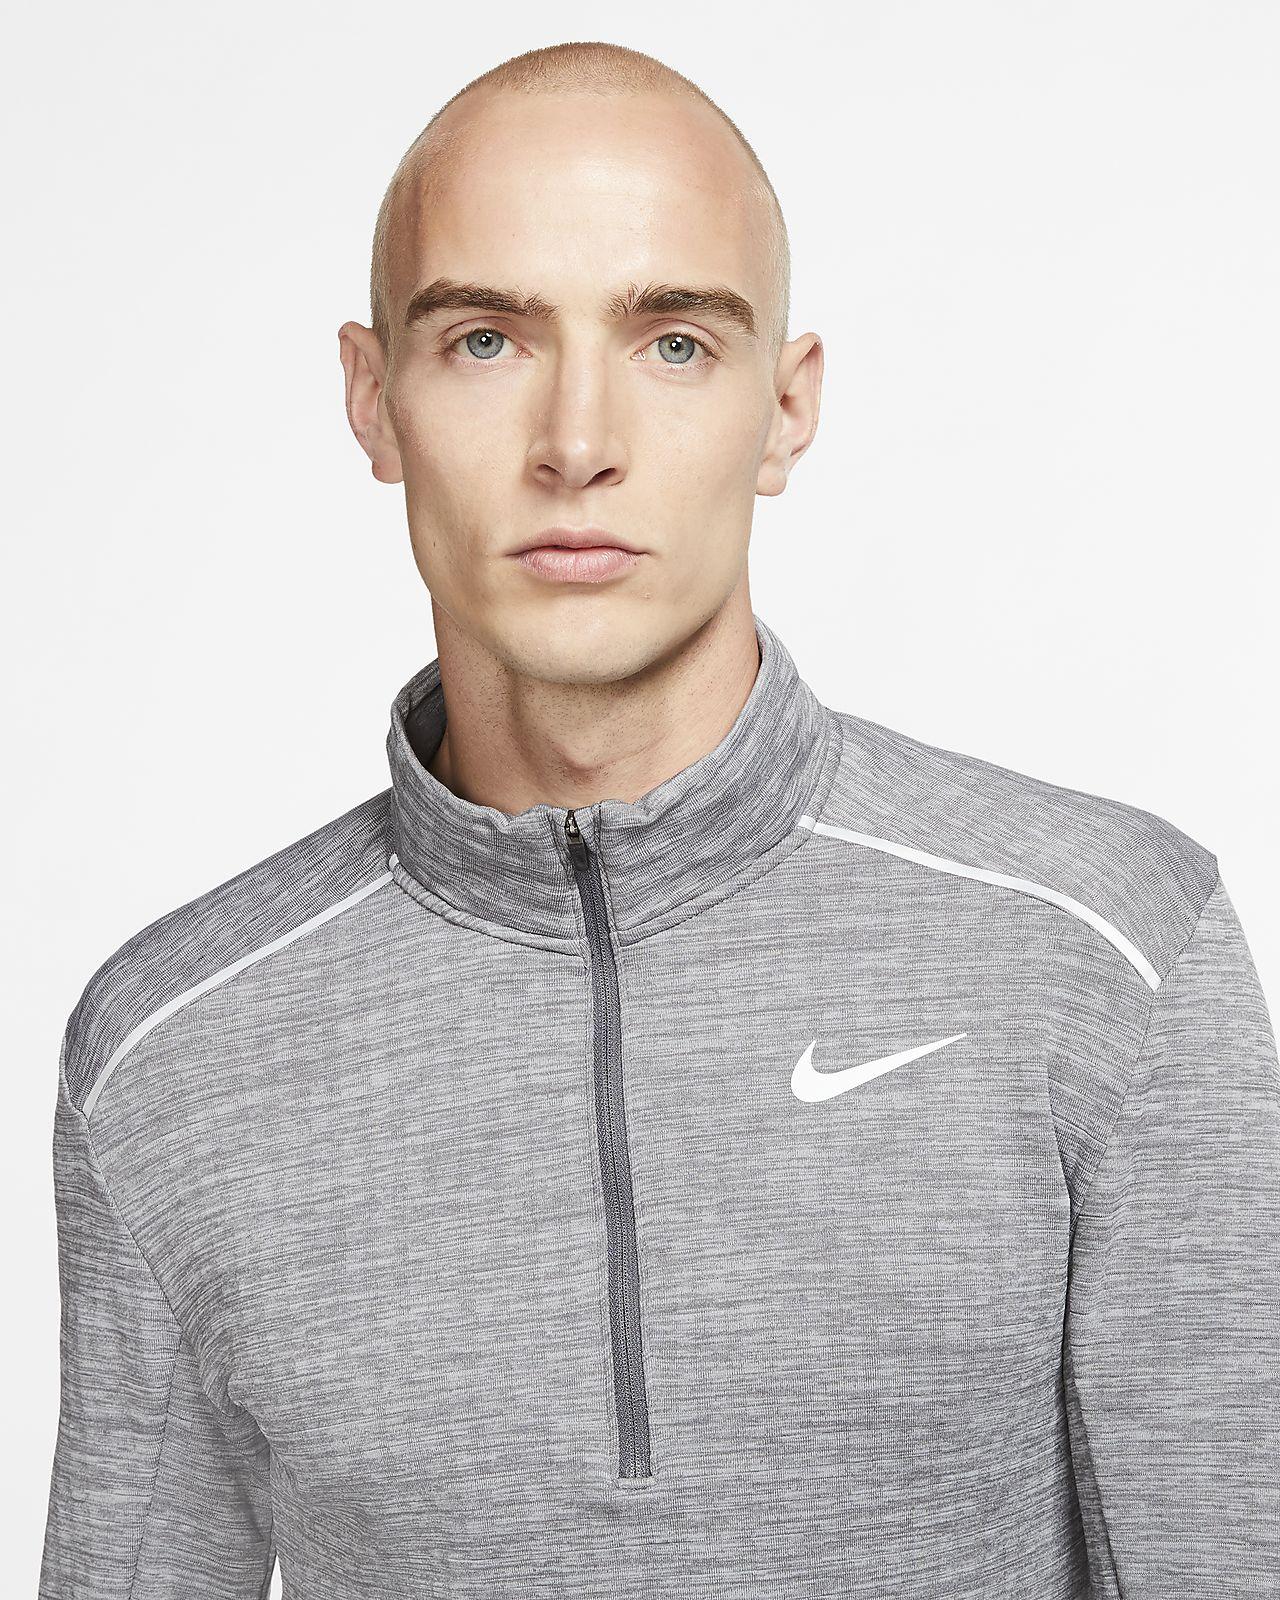 nett Nike Therma Sphere Element Men's Long Sleeve Half zip